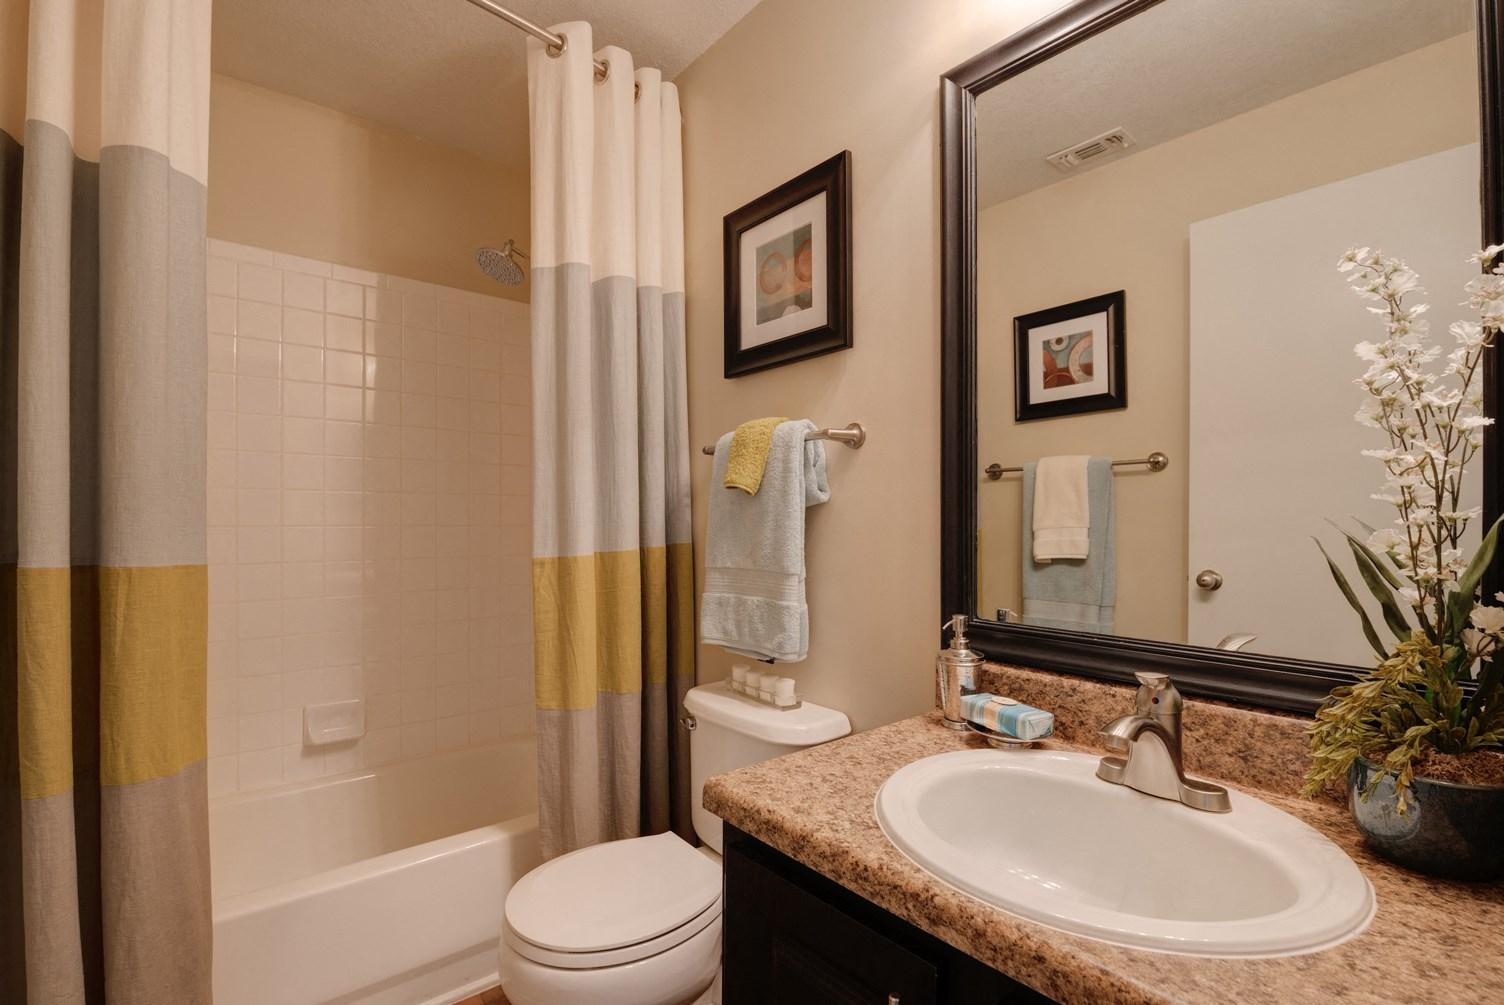 Bathroom at 150 Summit Apartments in Birmingham, AL